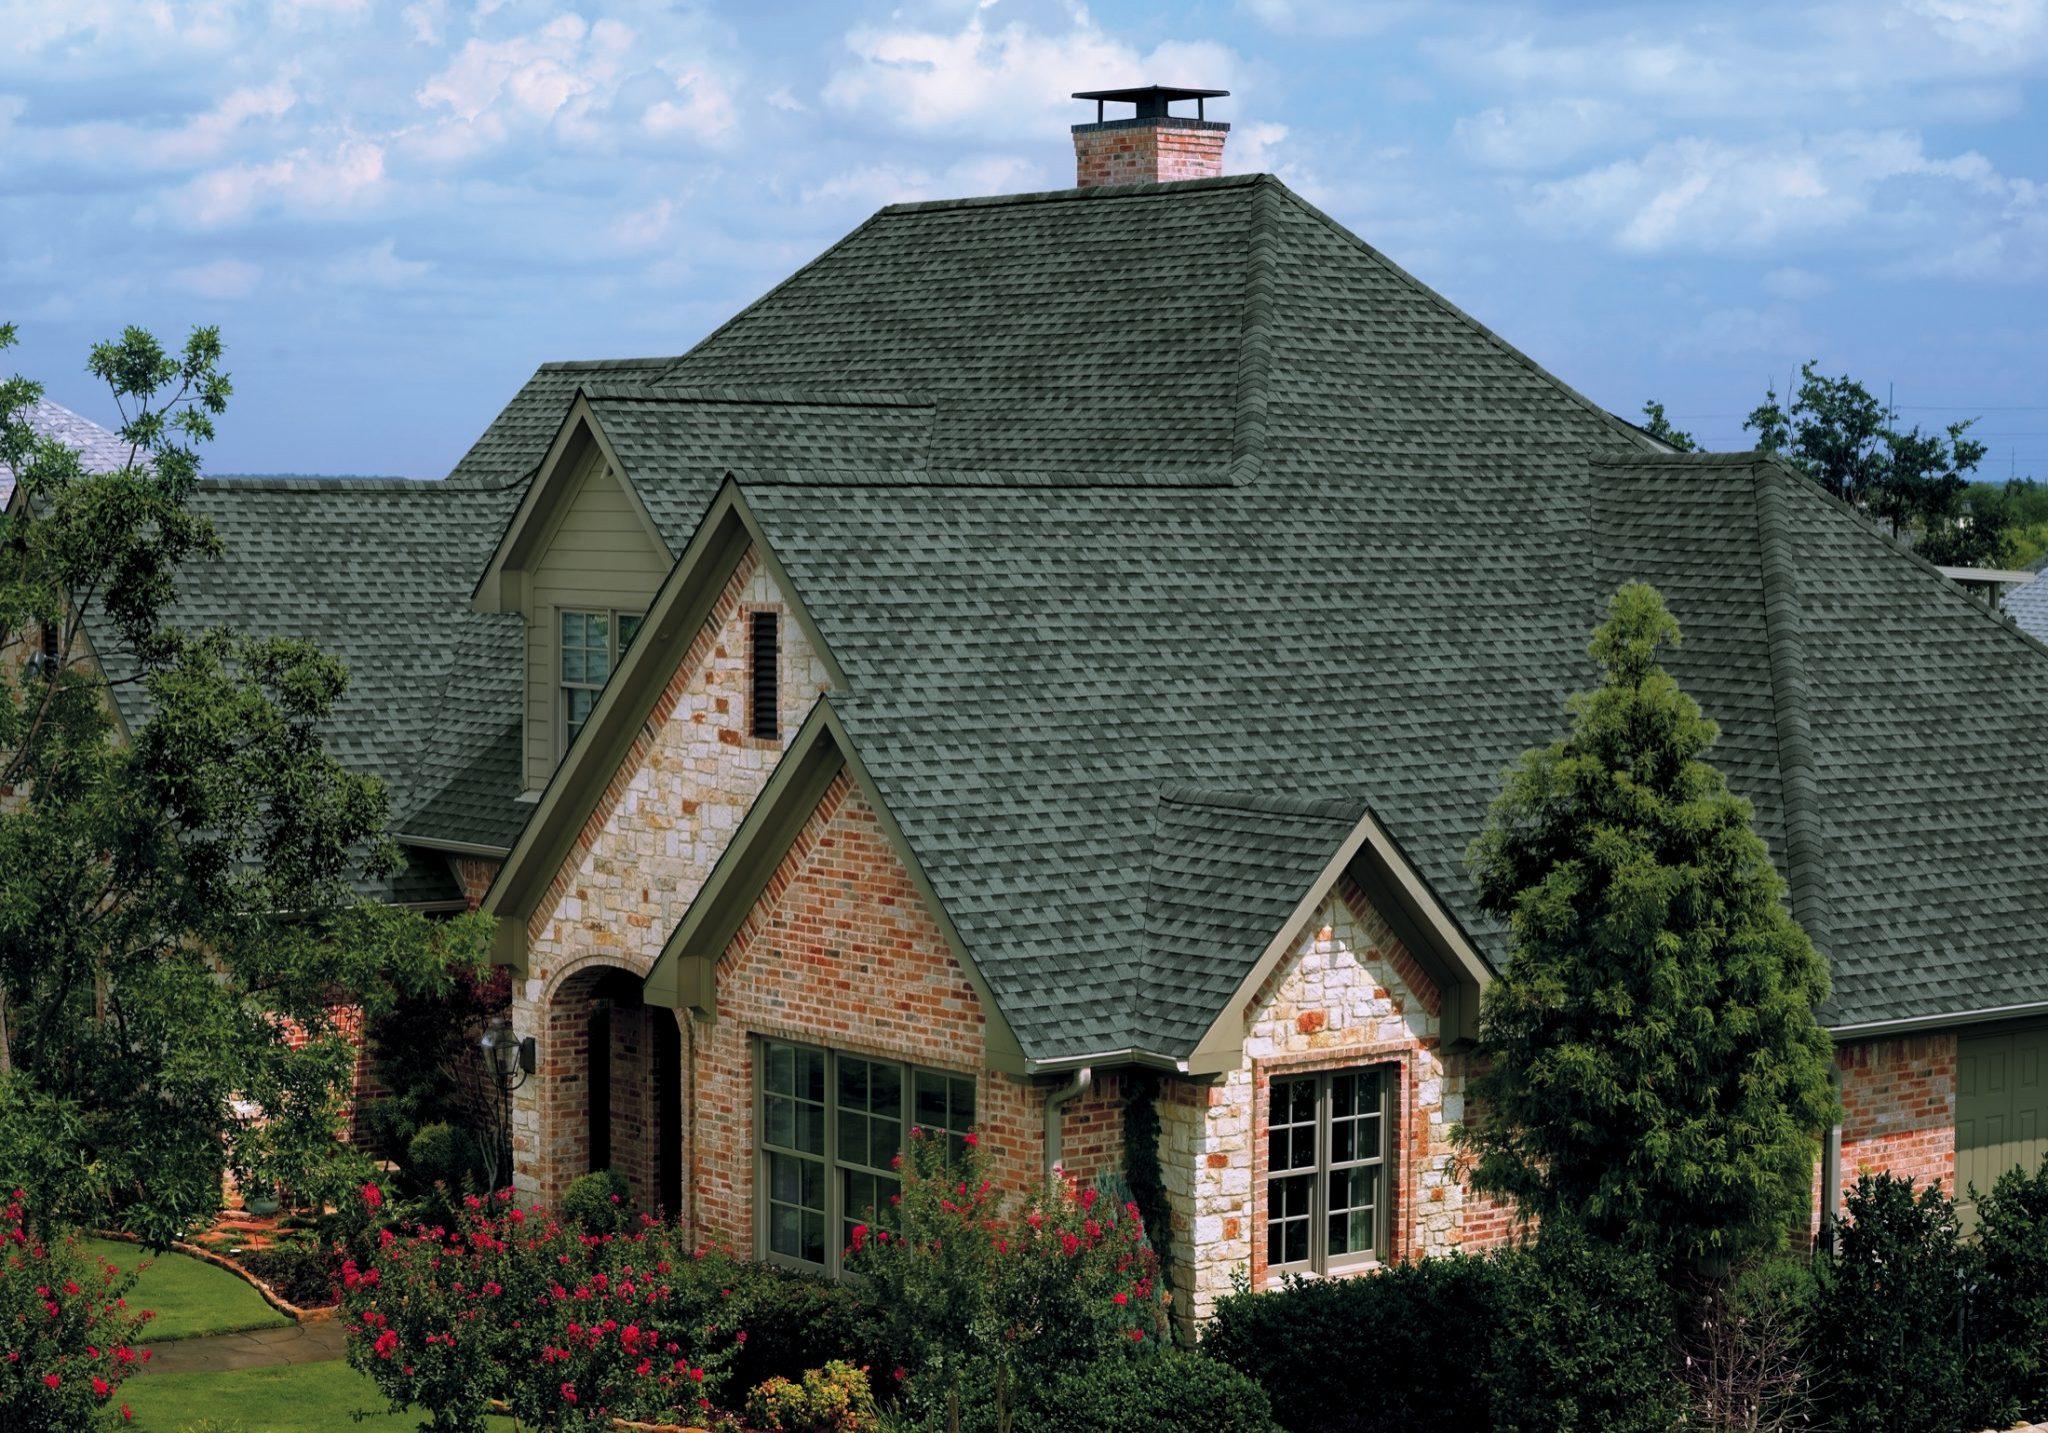 Asphalt Roof, Asphalt Shingles, Slate Grey Green Roof, Large Brick House